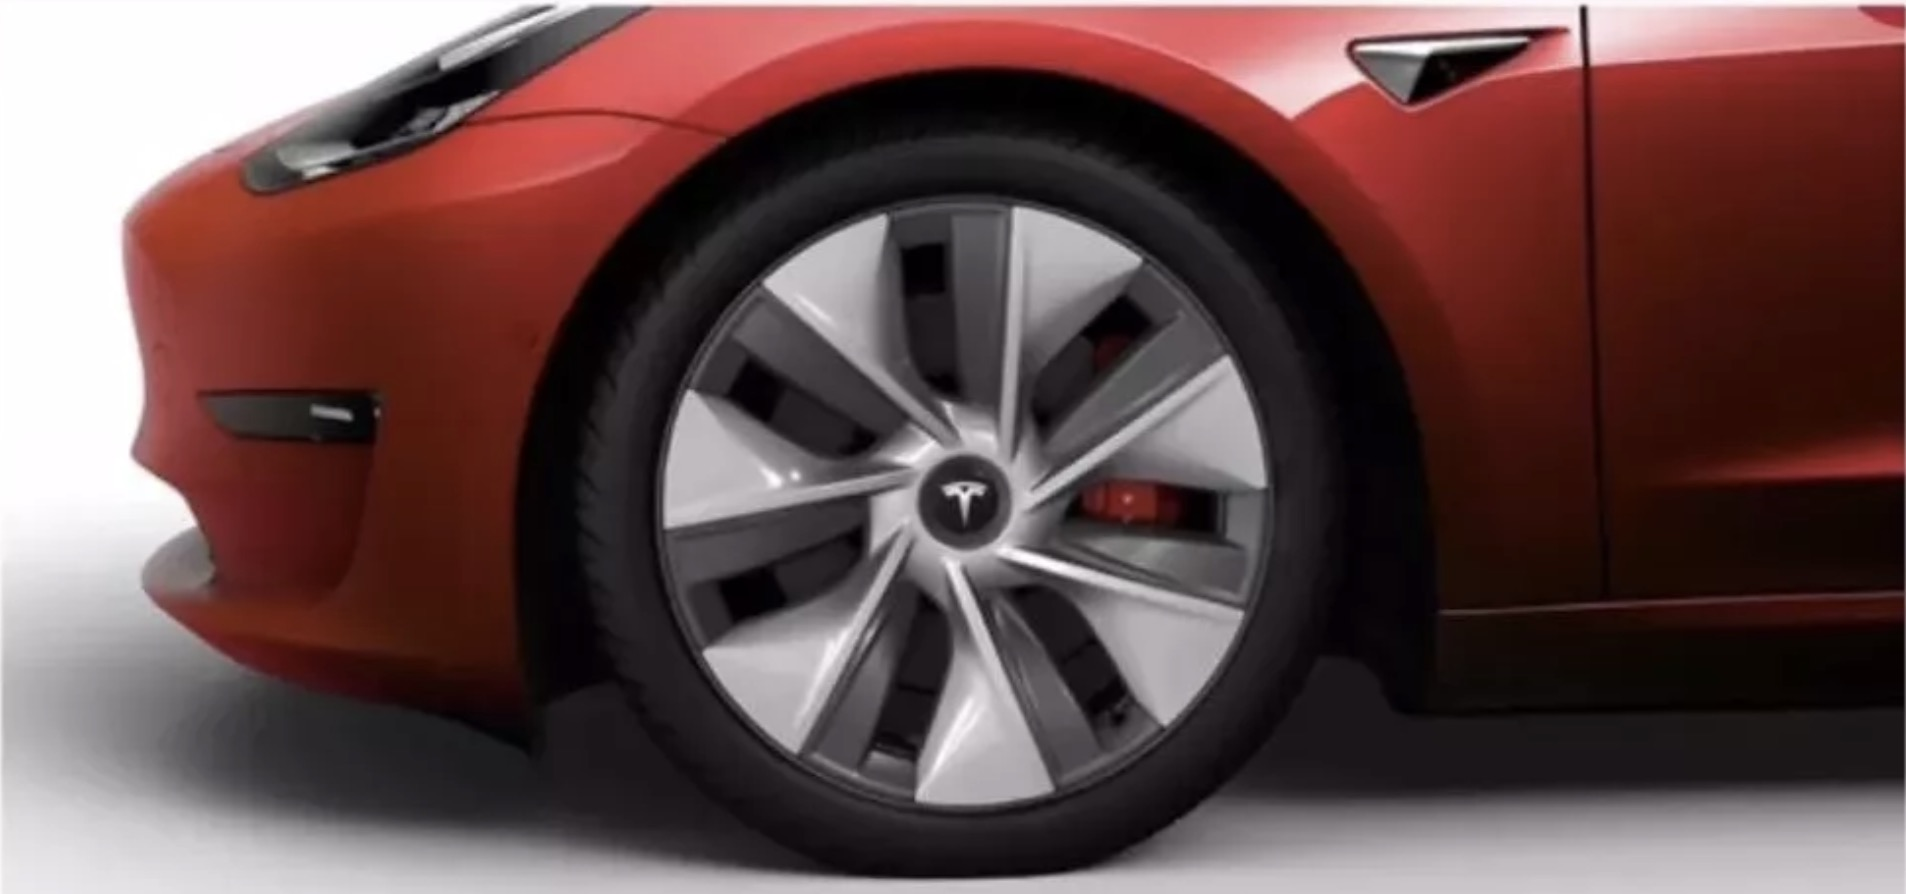 Tesla Model 3 orders open to Chinese customers